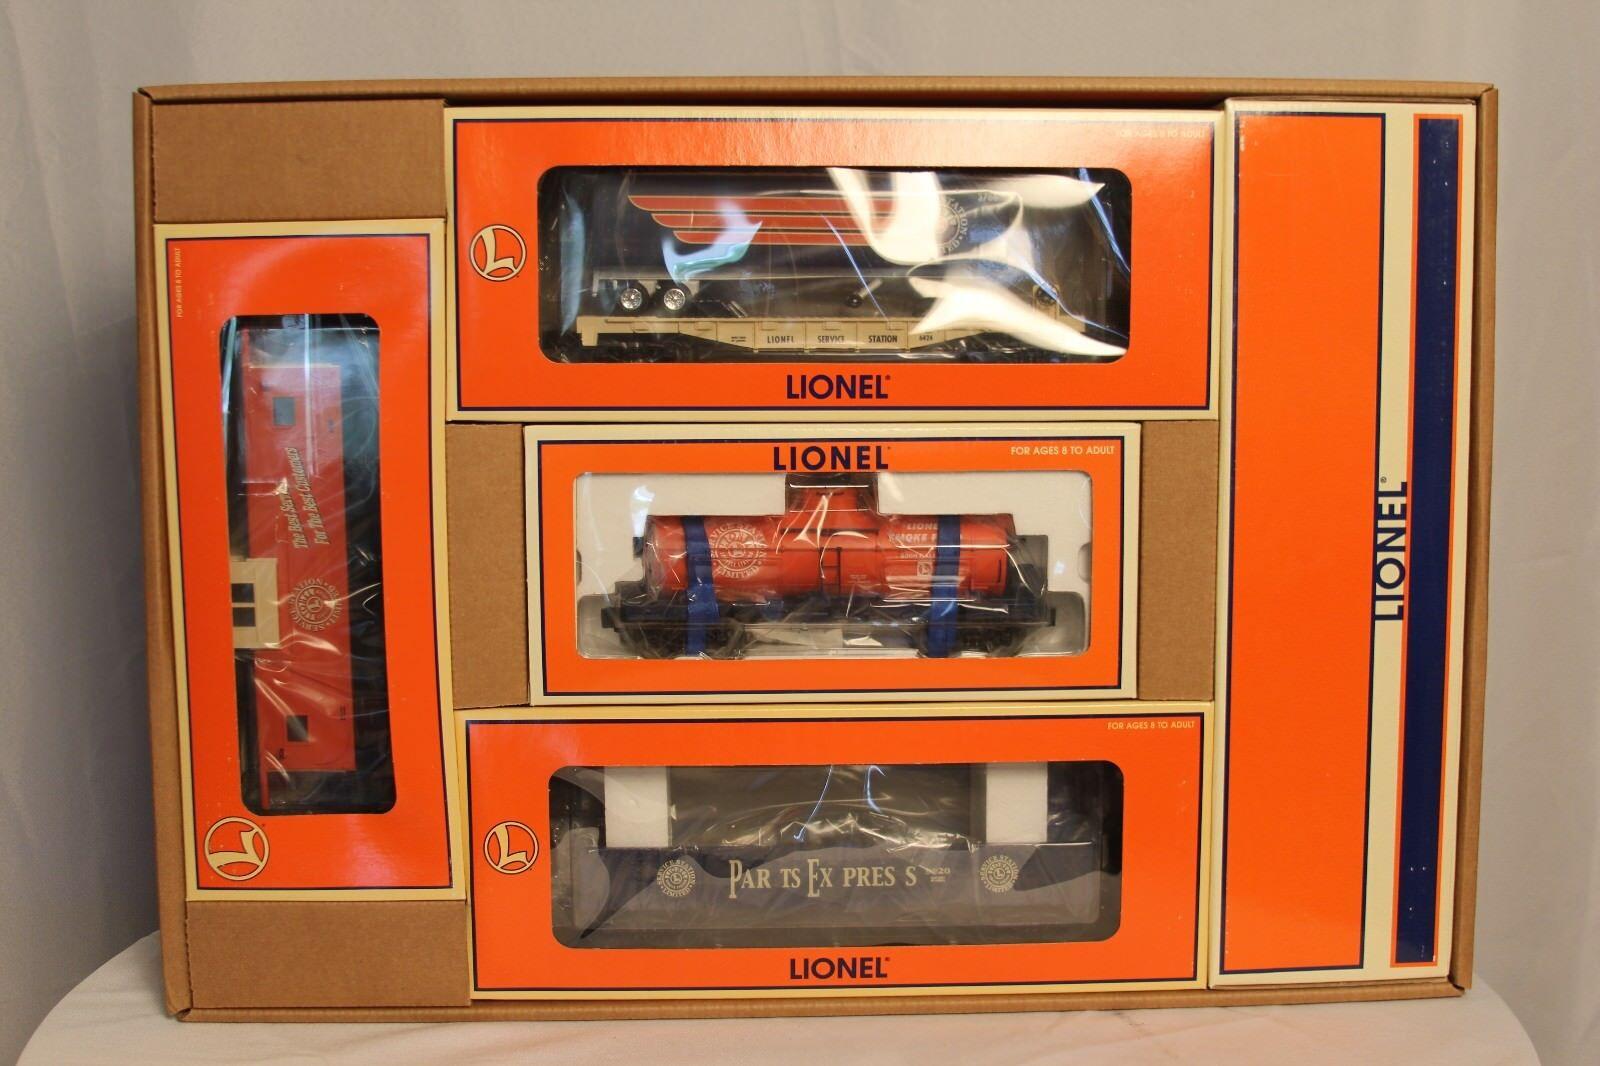 LIONEL 2000 SERVICE STATION SPECIAL SET ~ LIMITED EDITION ~NOS